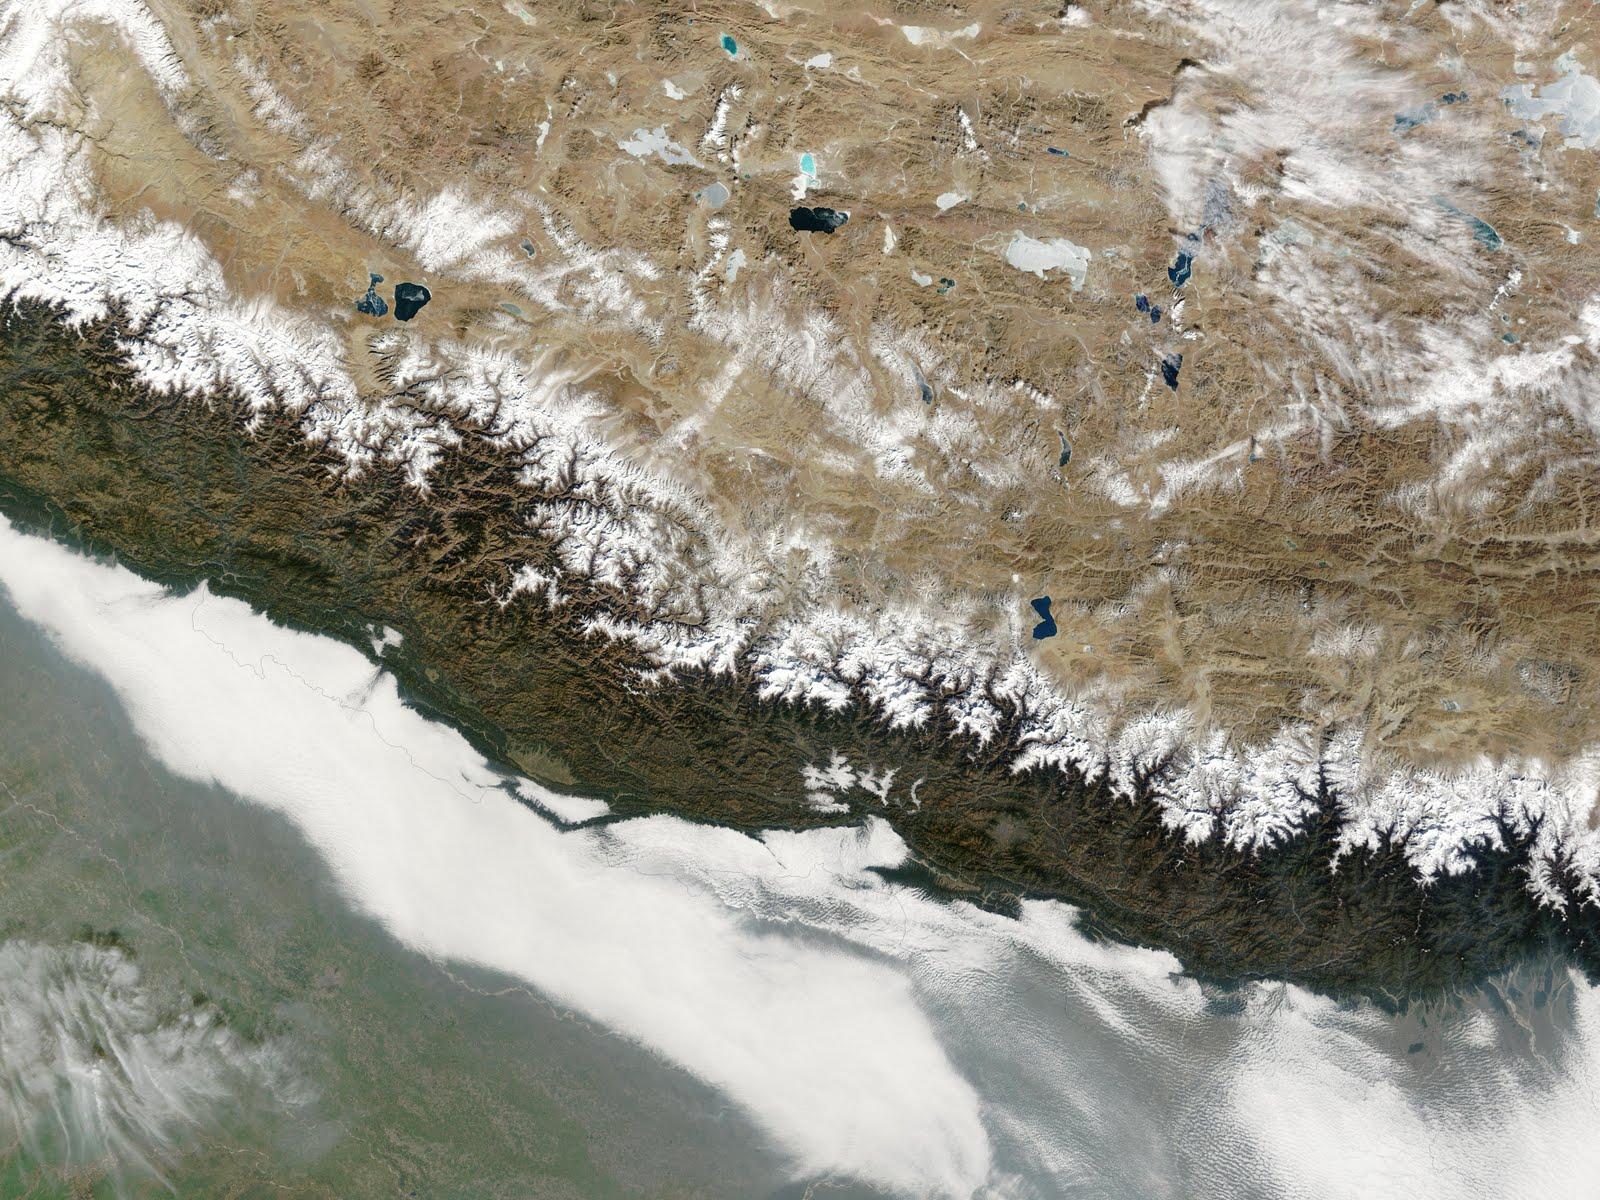 http://3.bp.blogspot.com/-6vci2CVshzM/TdGB3cyvJuI/AAAAAAAAAuY/j5_AgIyTiUc/s1600/Nepal.A2004009.0510.250m.jpg